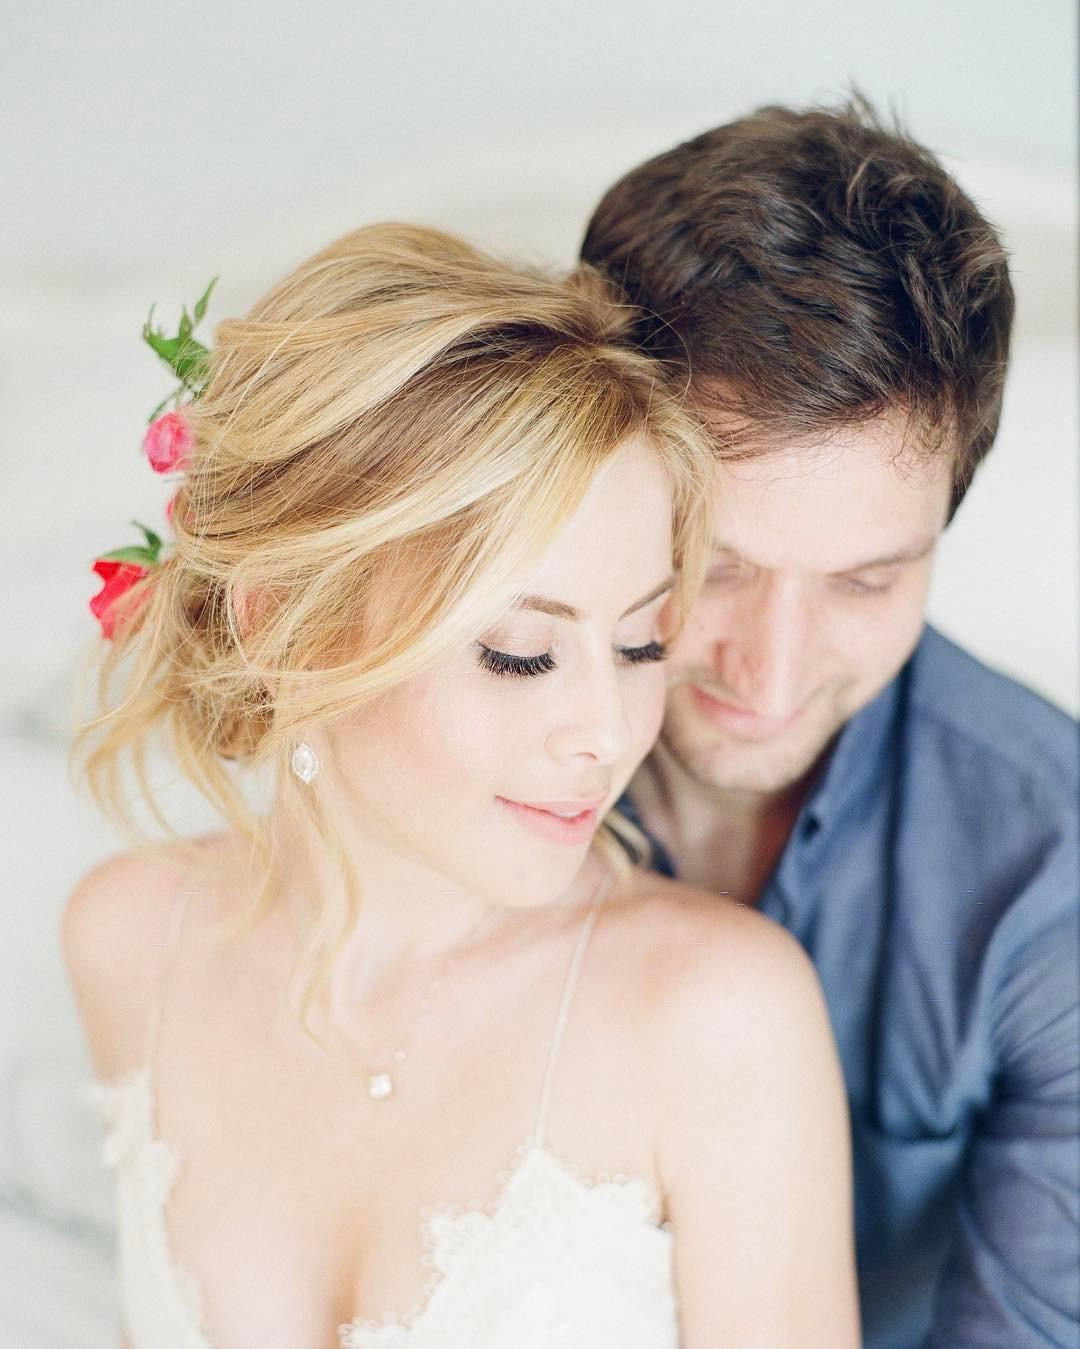 Tara Lipinski and Todd Kapostasy at Their Wedding Shower